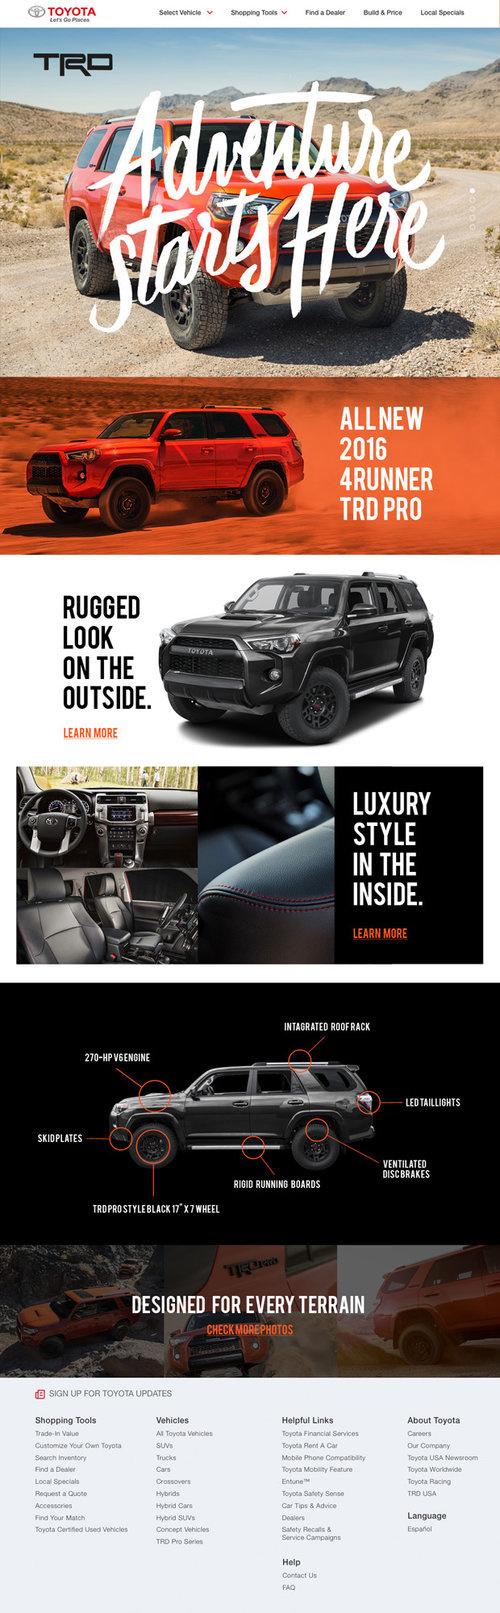 Toyota 4Runner Landing Page #web #design #UX #car